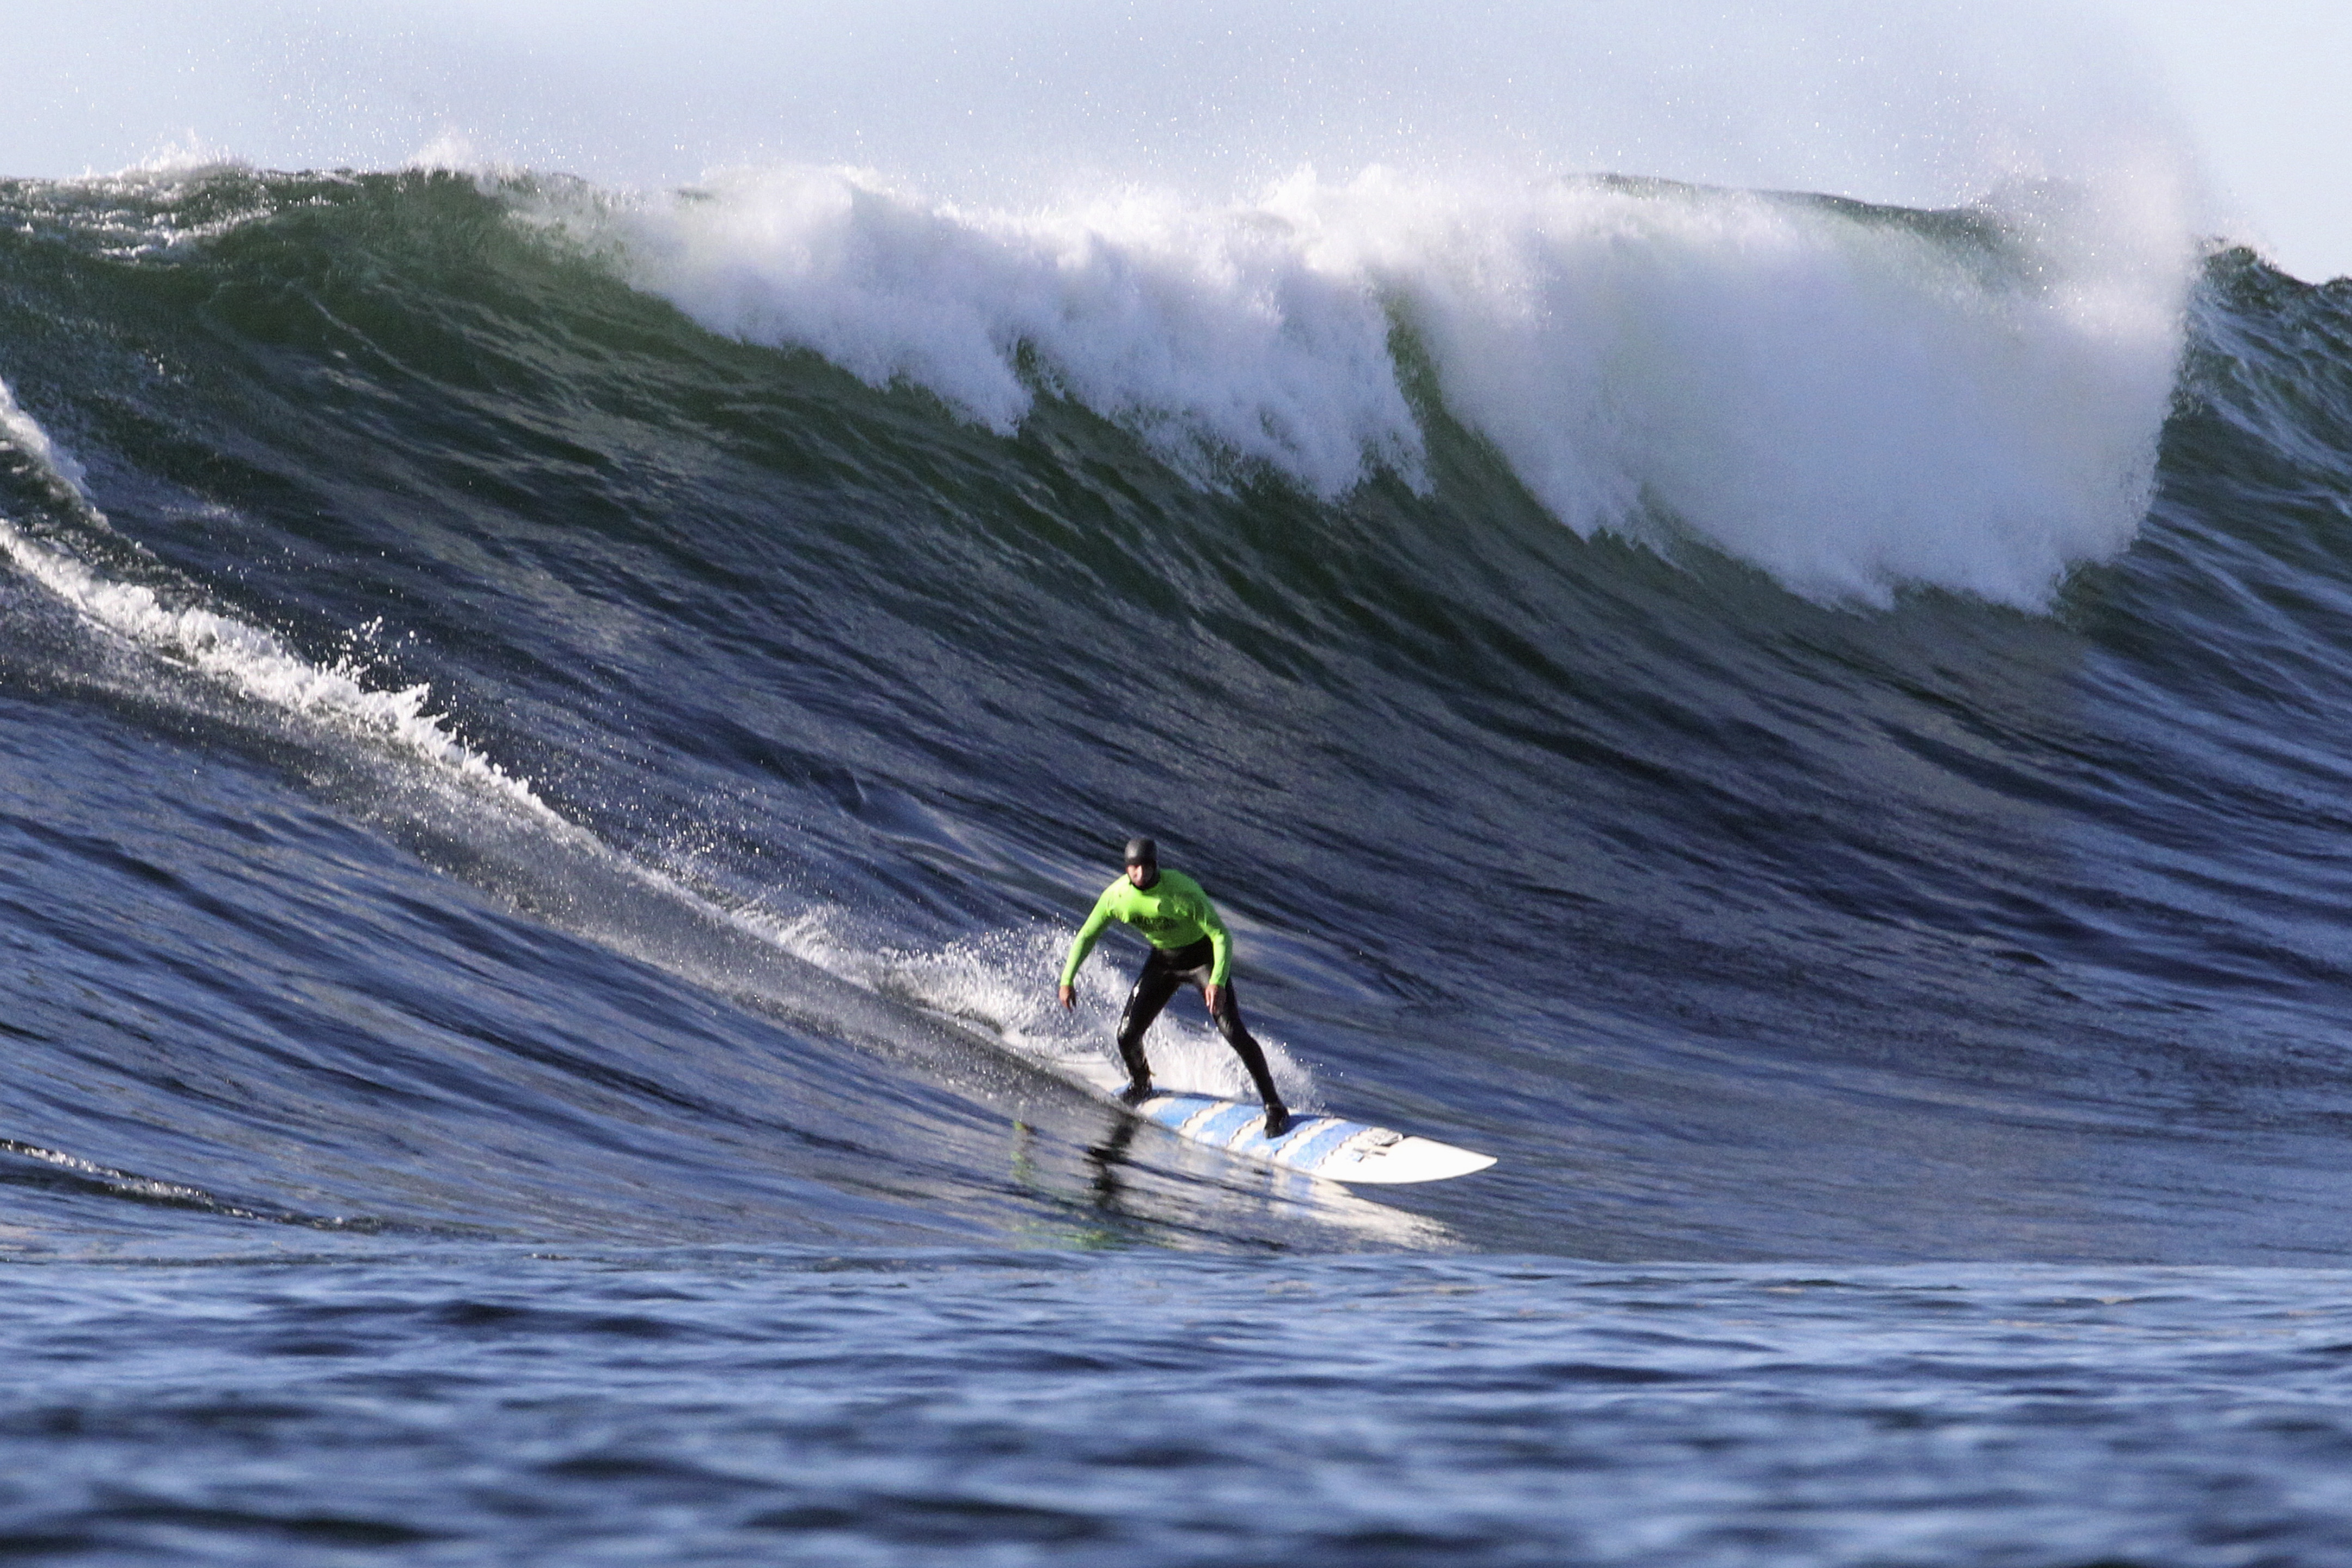 Santa Cruz surfer Shawn Dollar broke his neck surfing on the California coast Sept. 9.